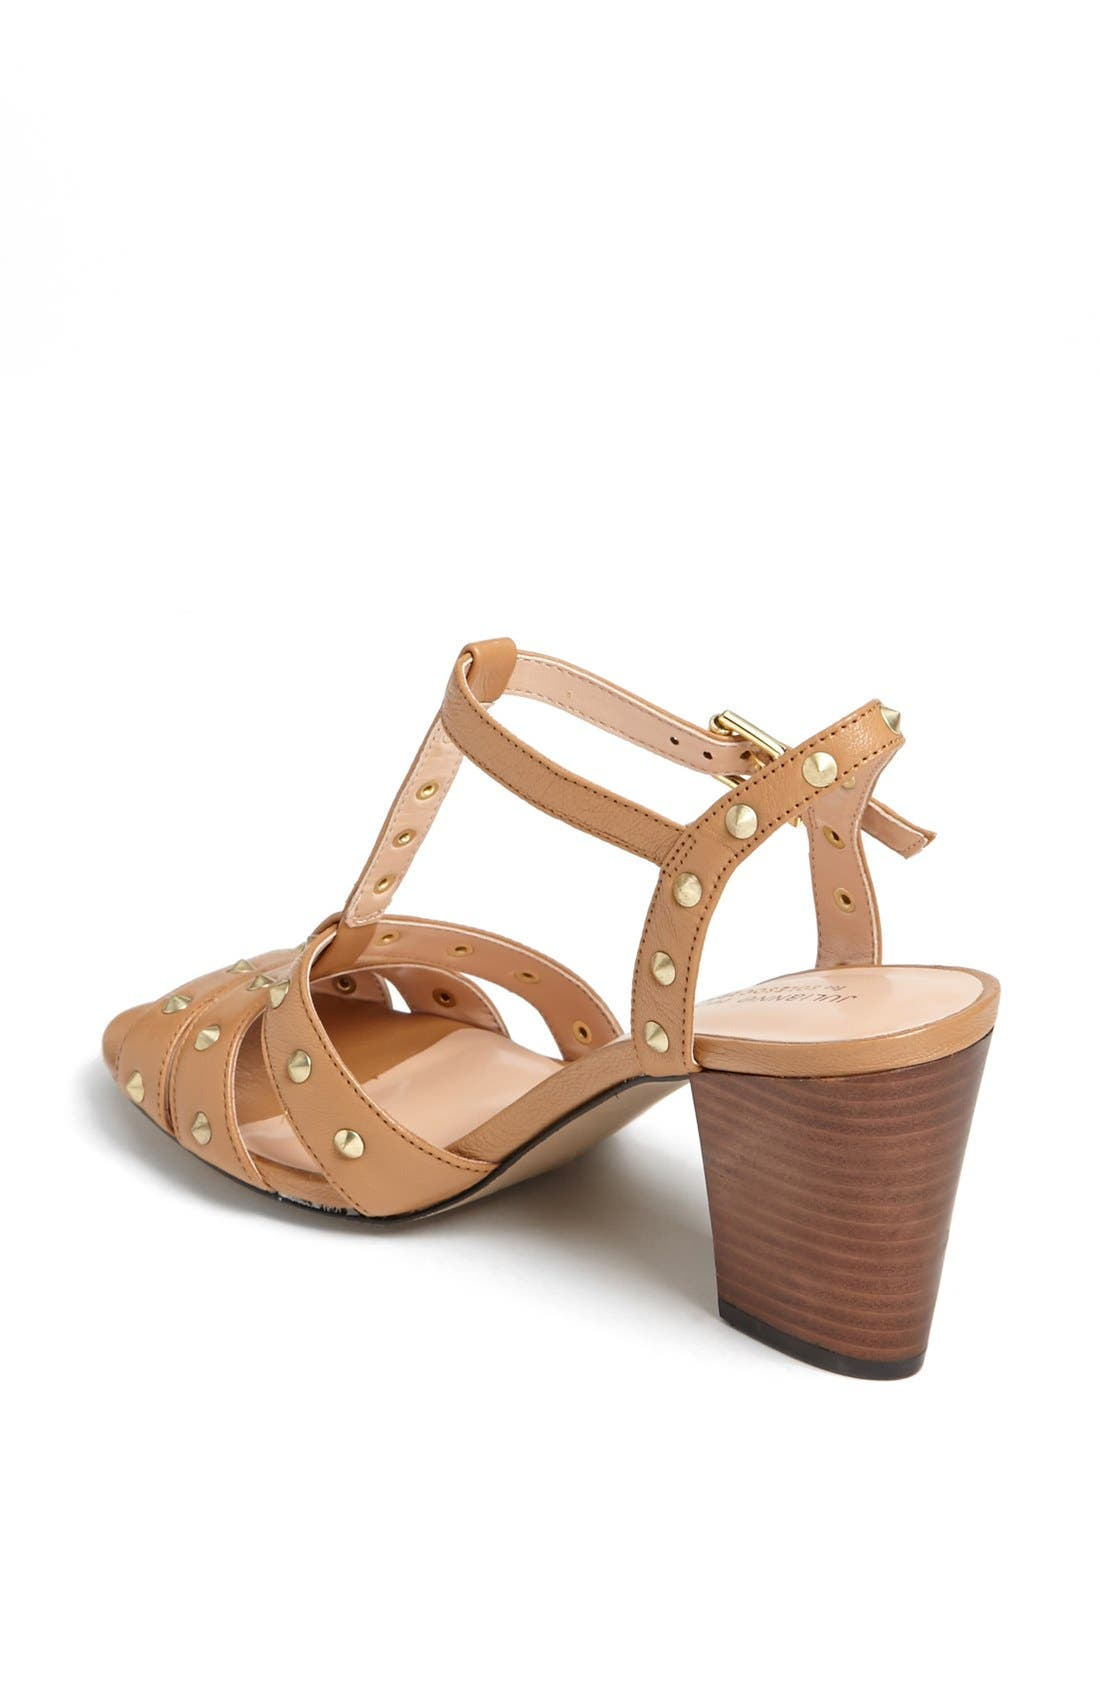 Alternate Image 2  - Julianne Hough for Sole Society 'Mollie' Sandal